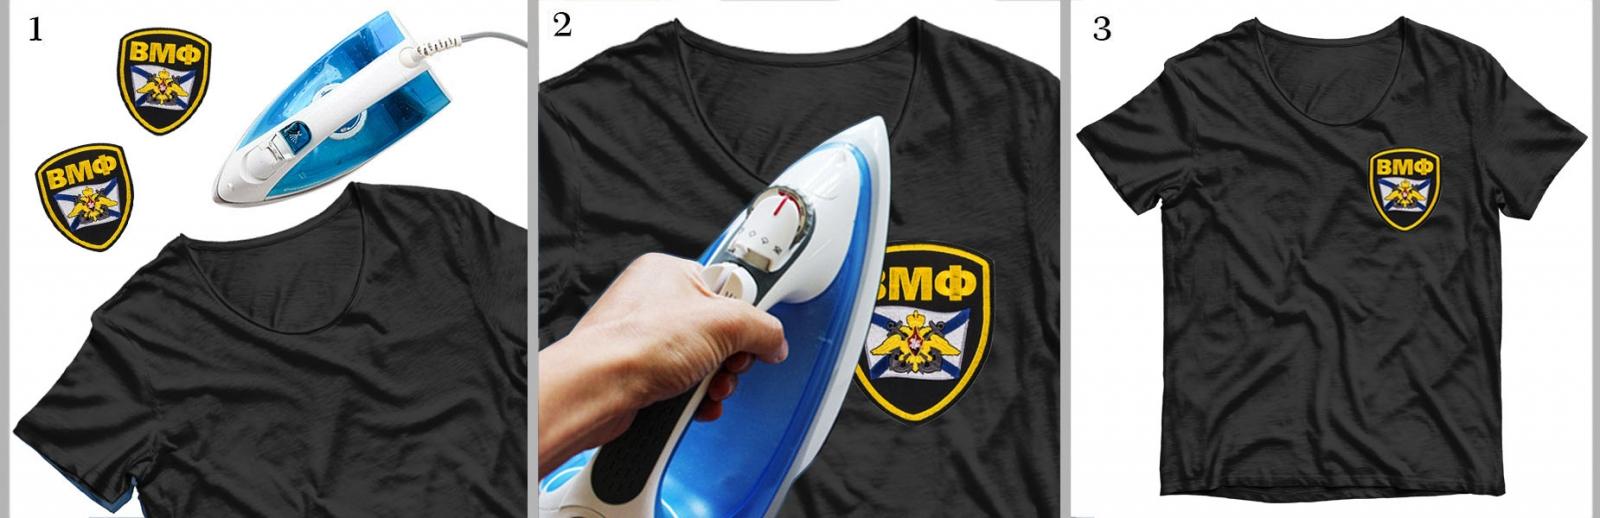 Термоклеевый шеврон ВМФ на футболке